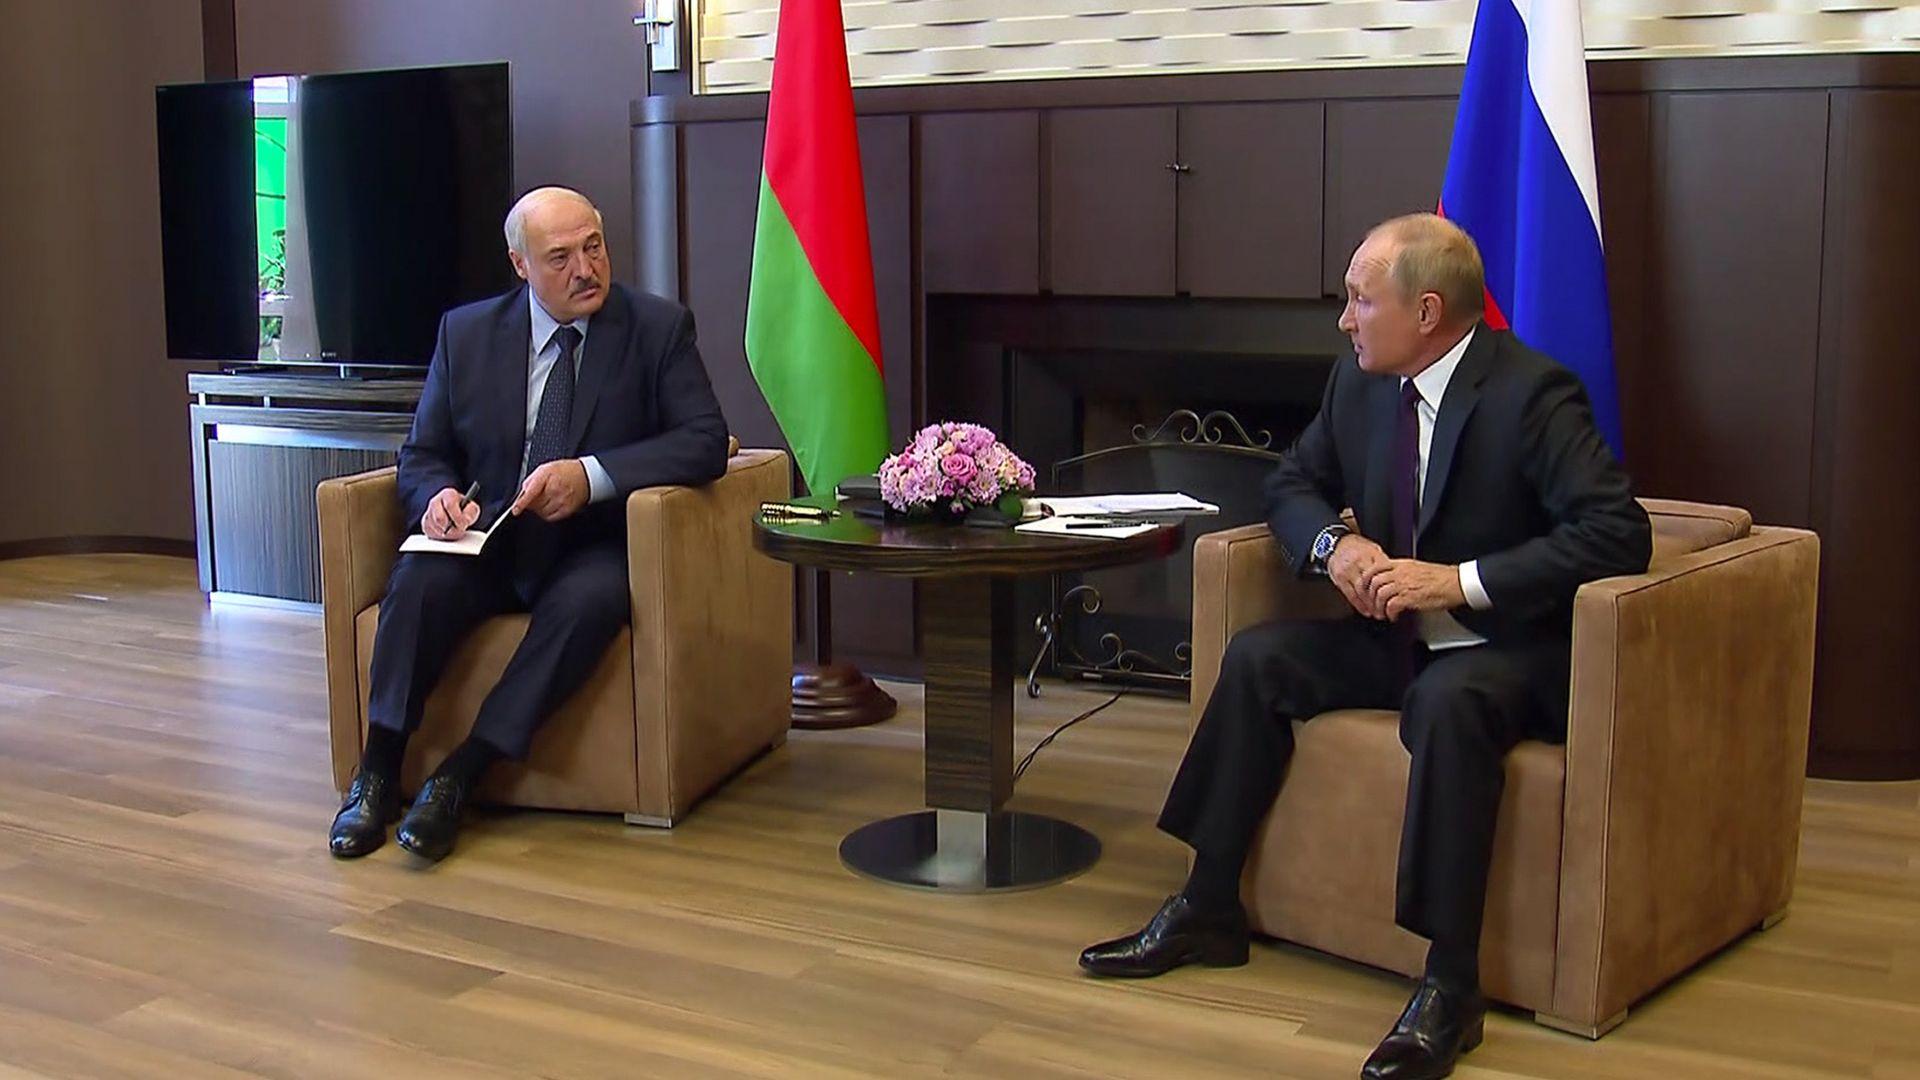 Лукашенко задейства военни учения с Русия, затваря границите с Литва и Полша